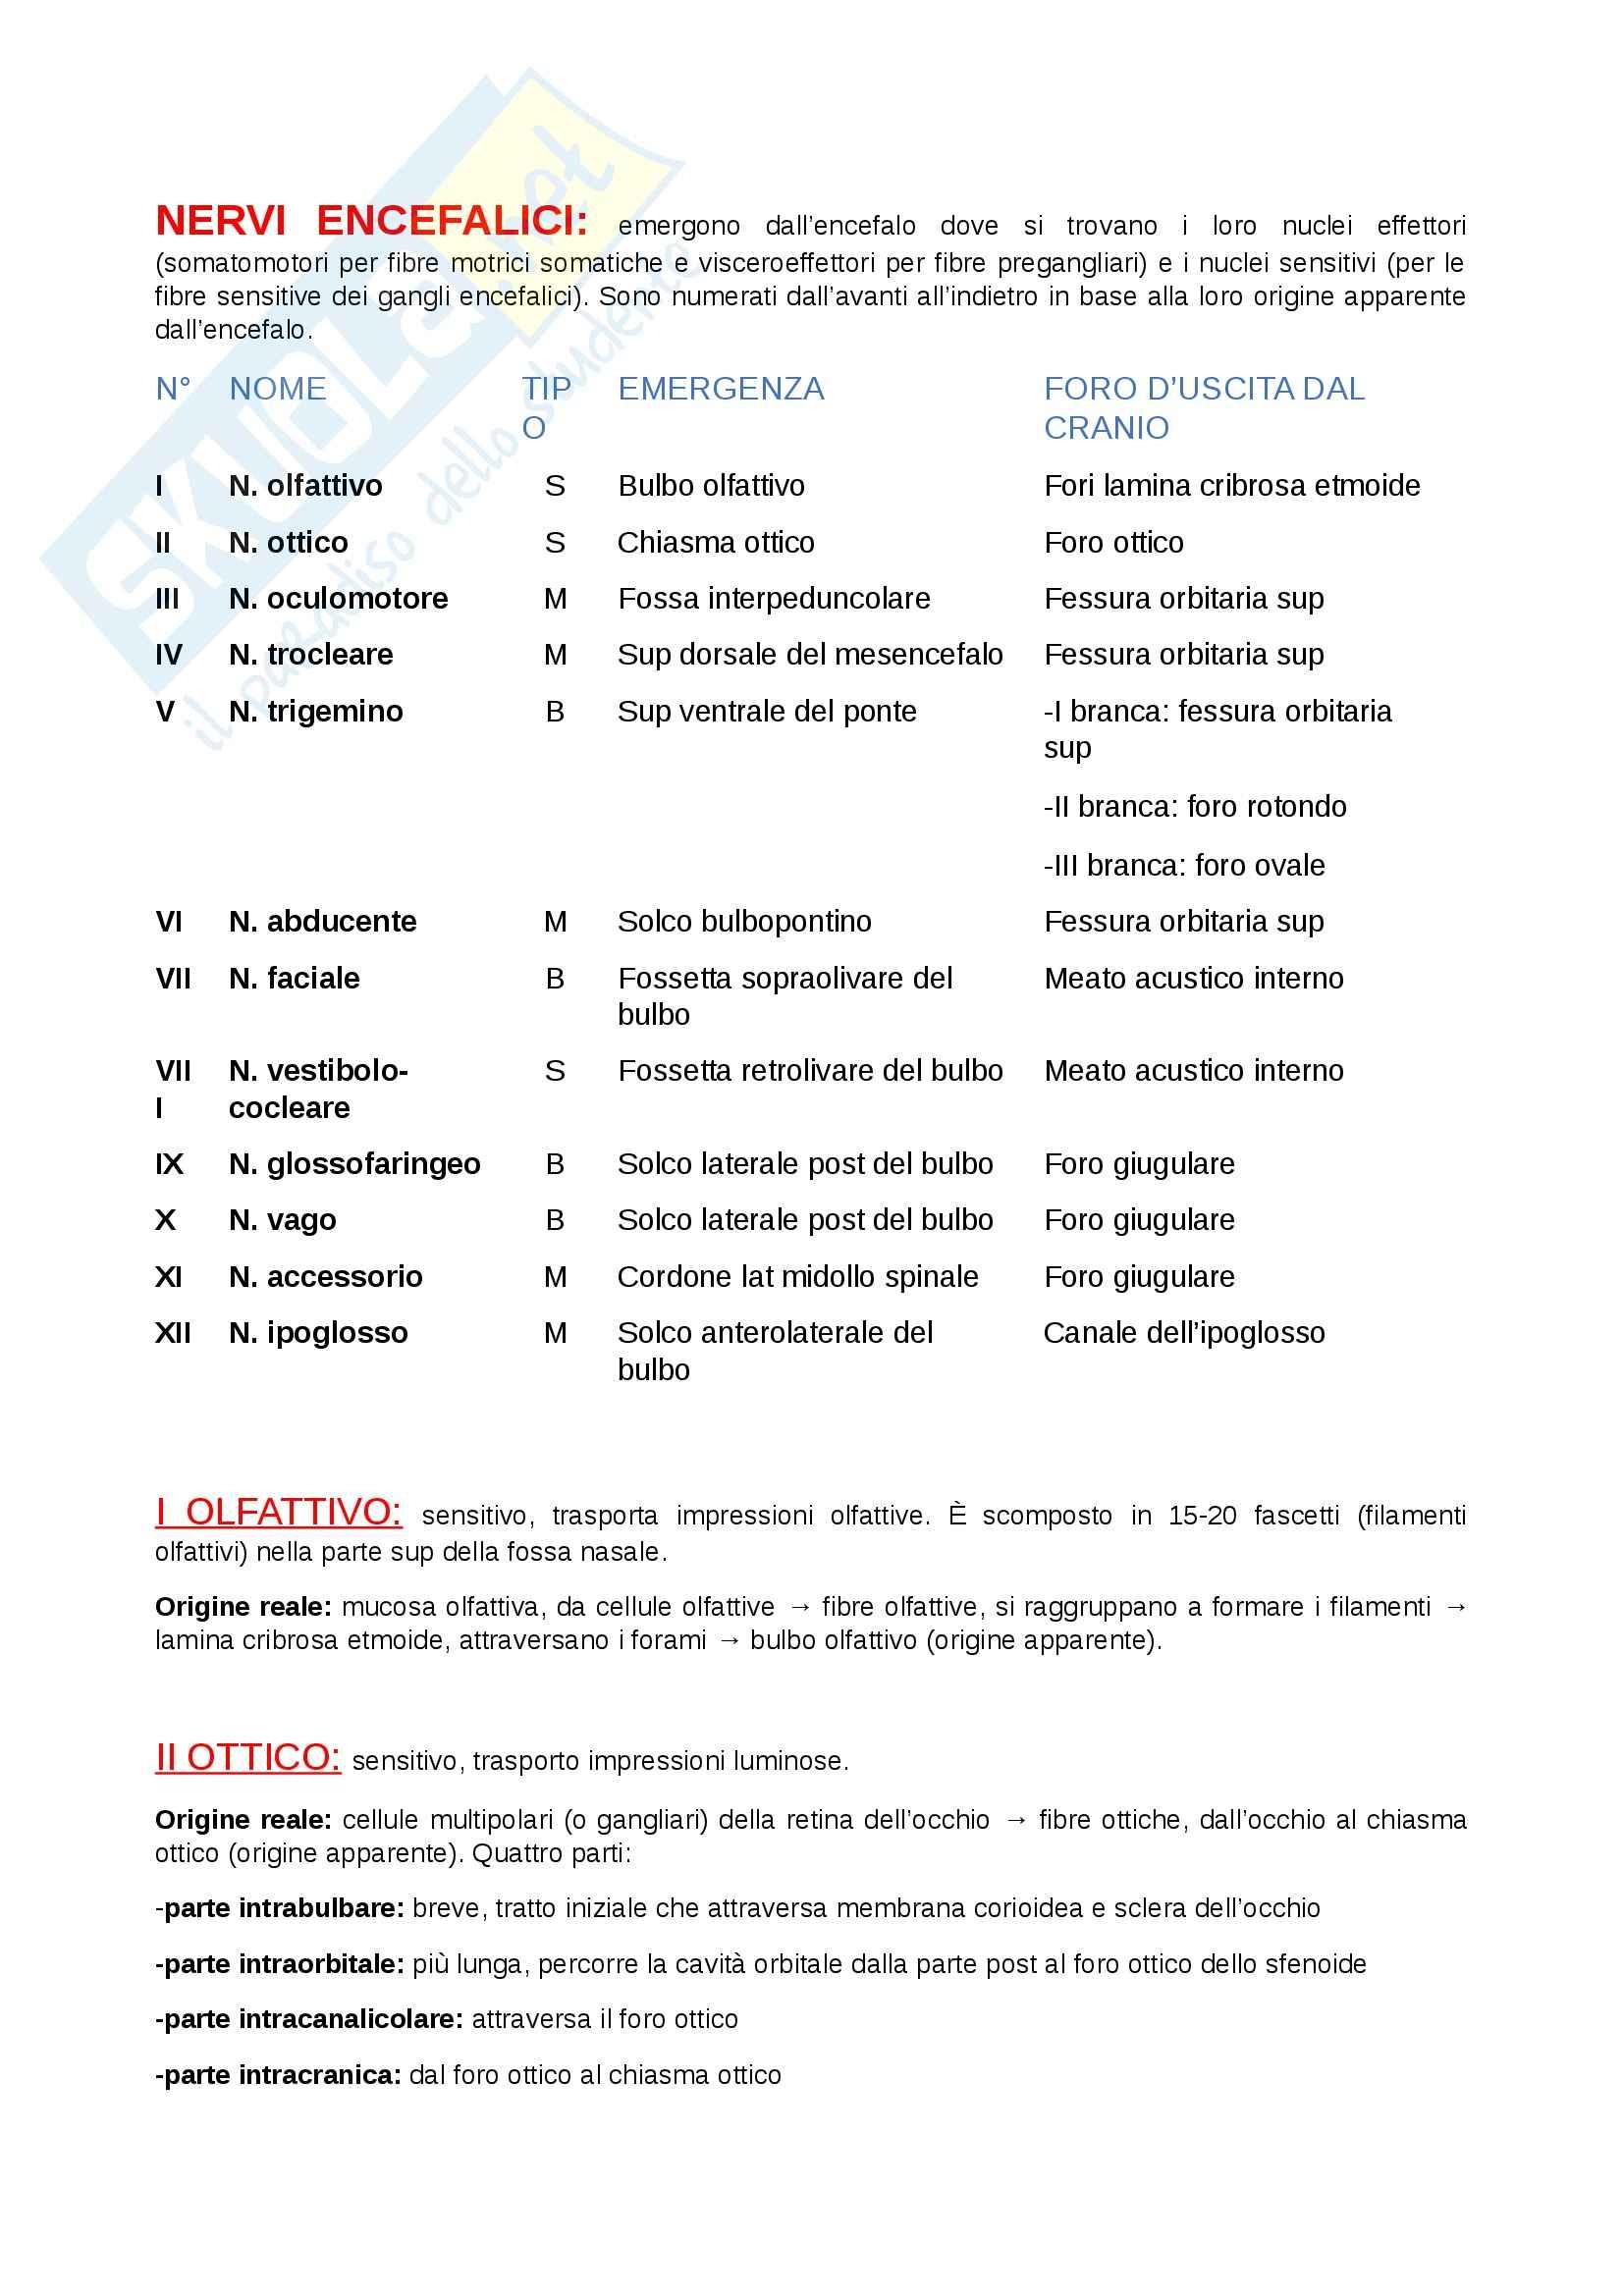 Nervi encefalici: Appunti di Anatomia